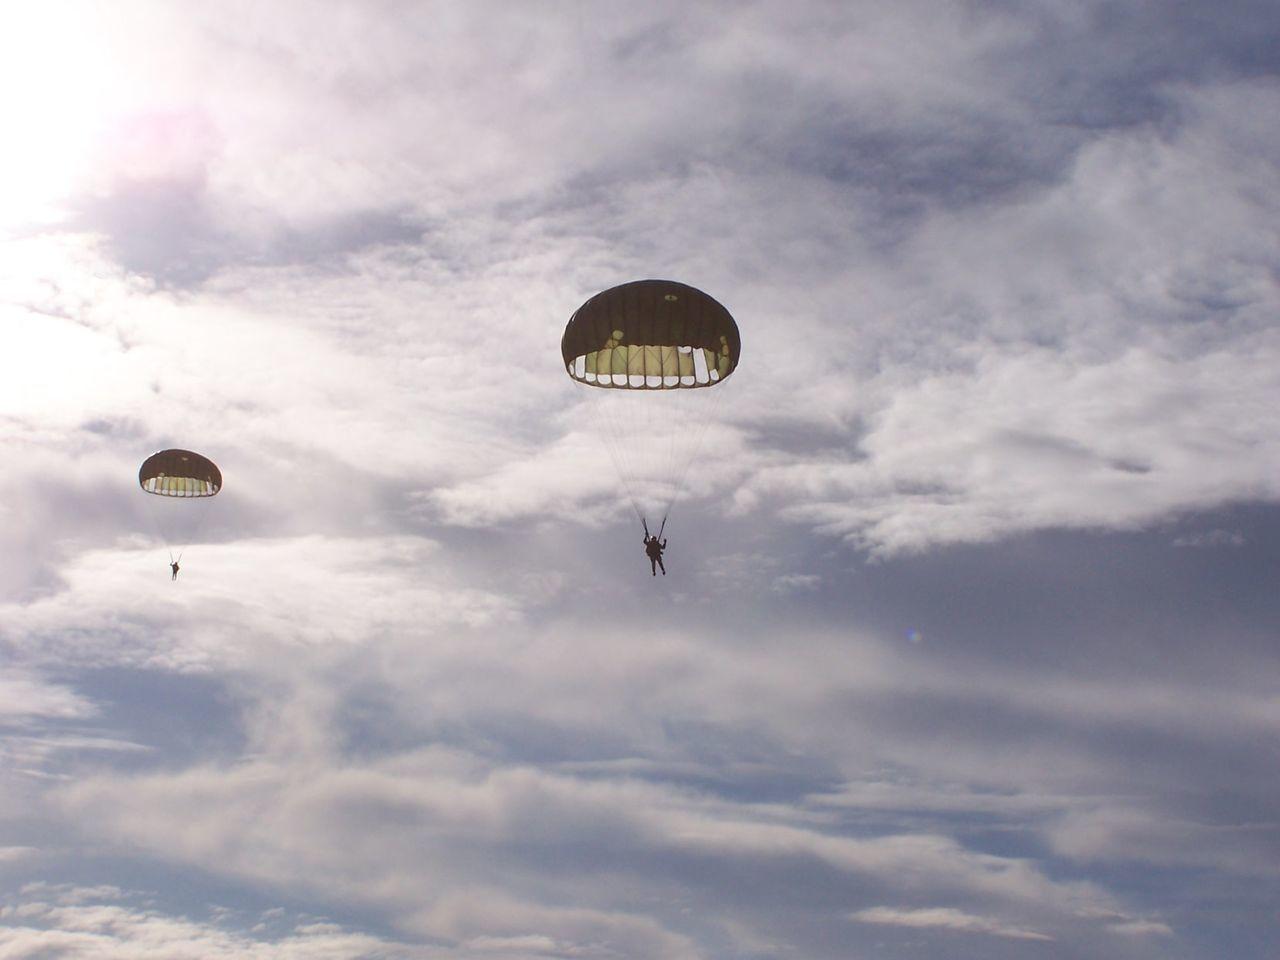 Training jump, old times, Memories ❤ Murcia Original Experiences Paratrooper SPAIN Adventure Club